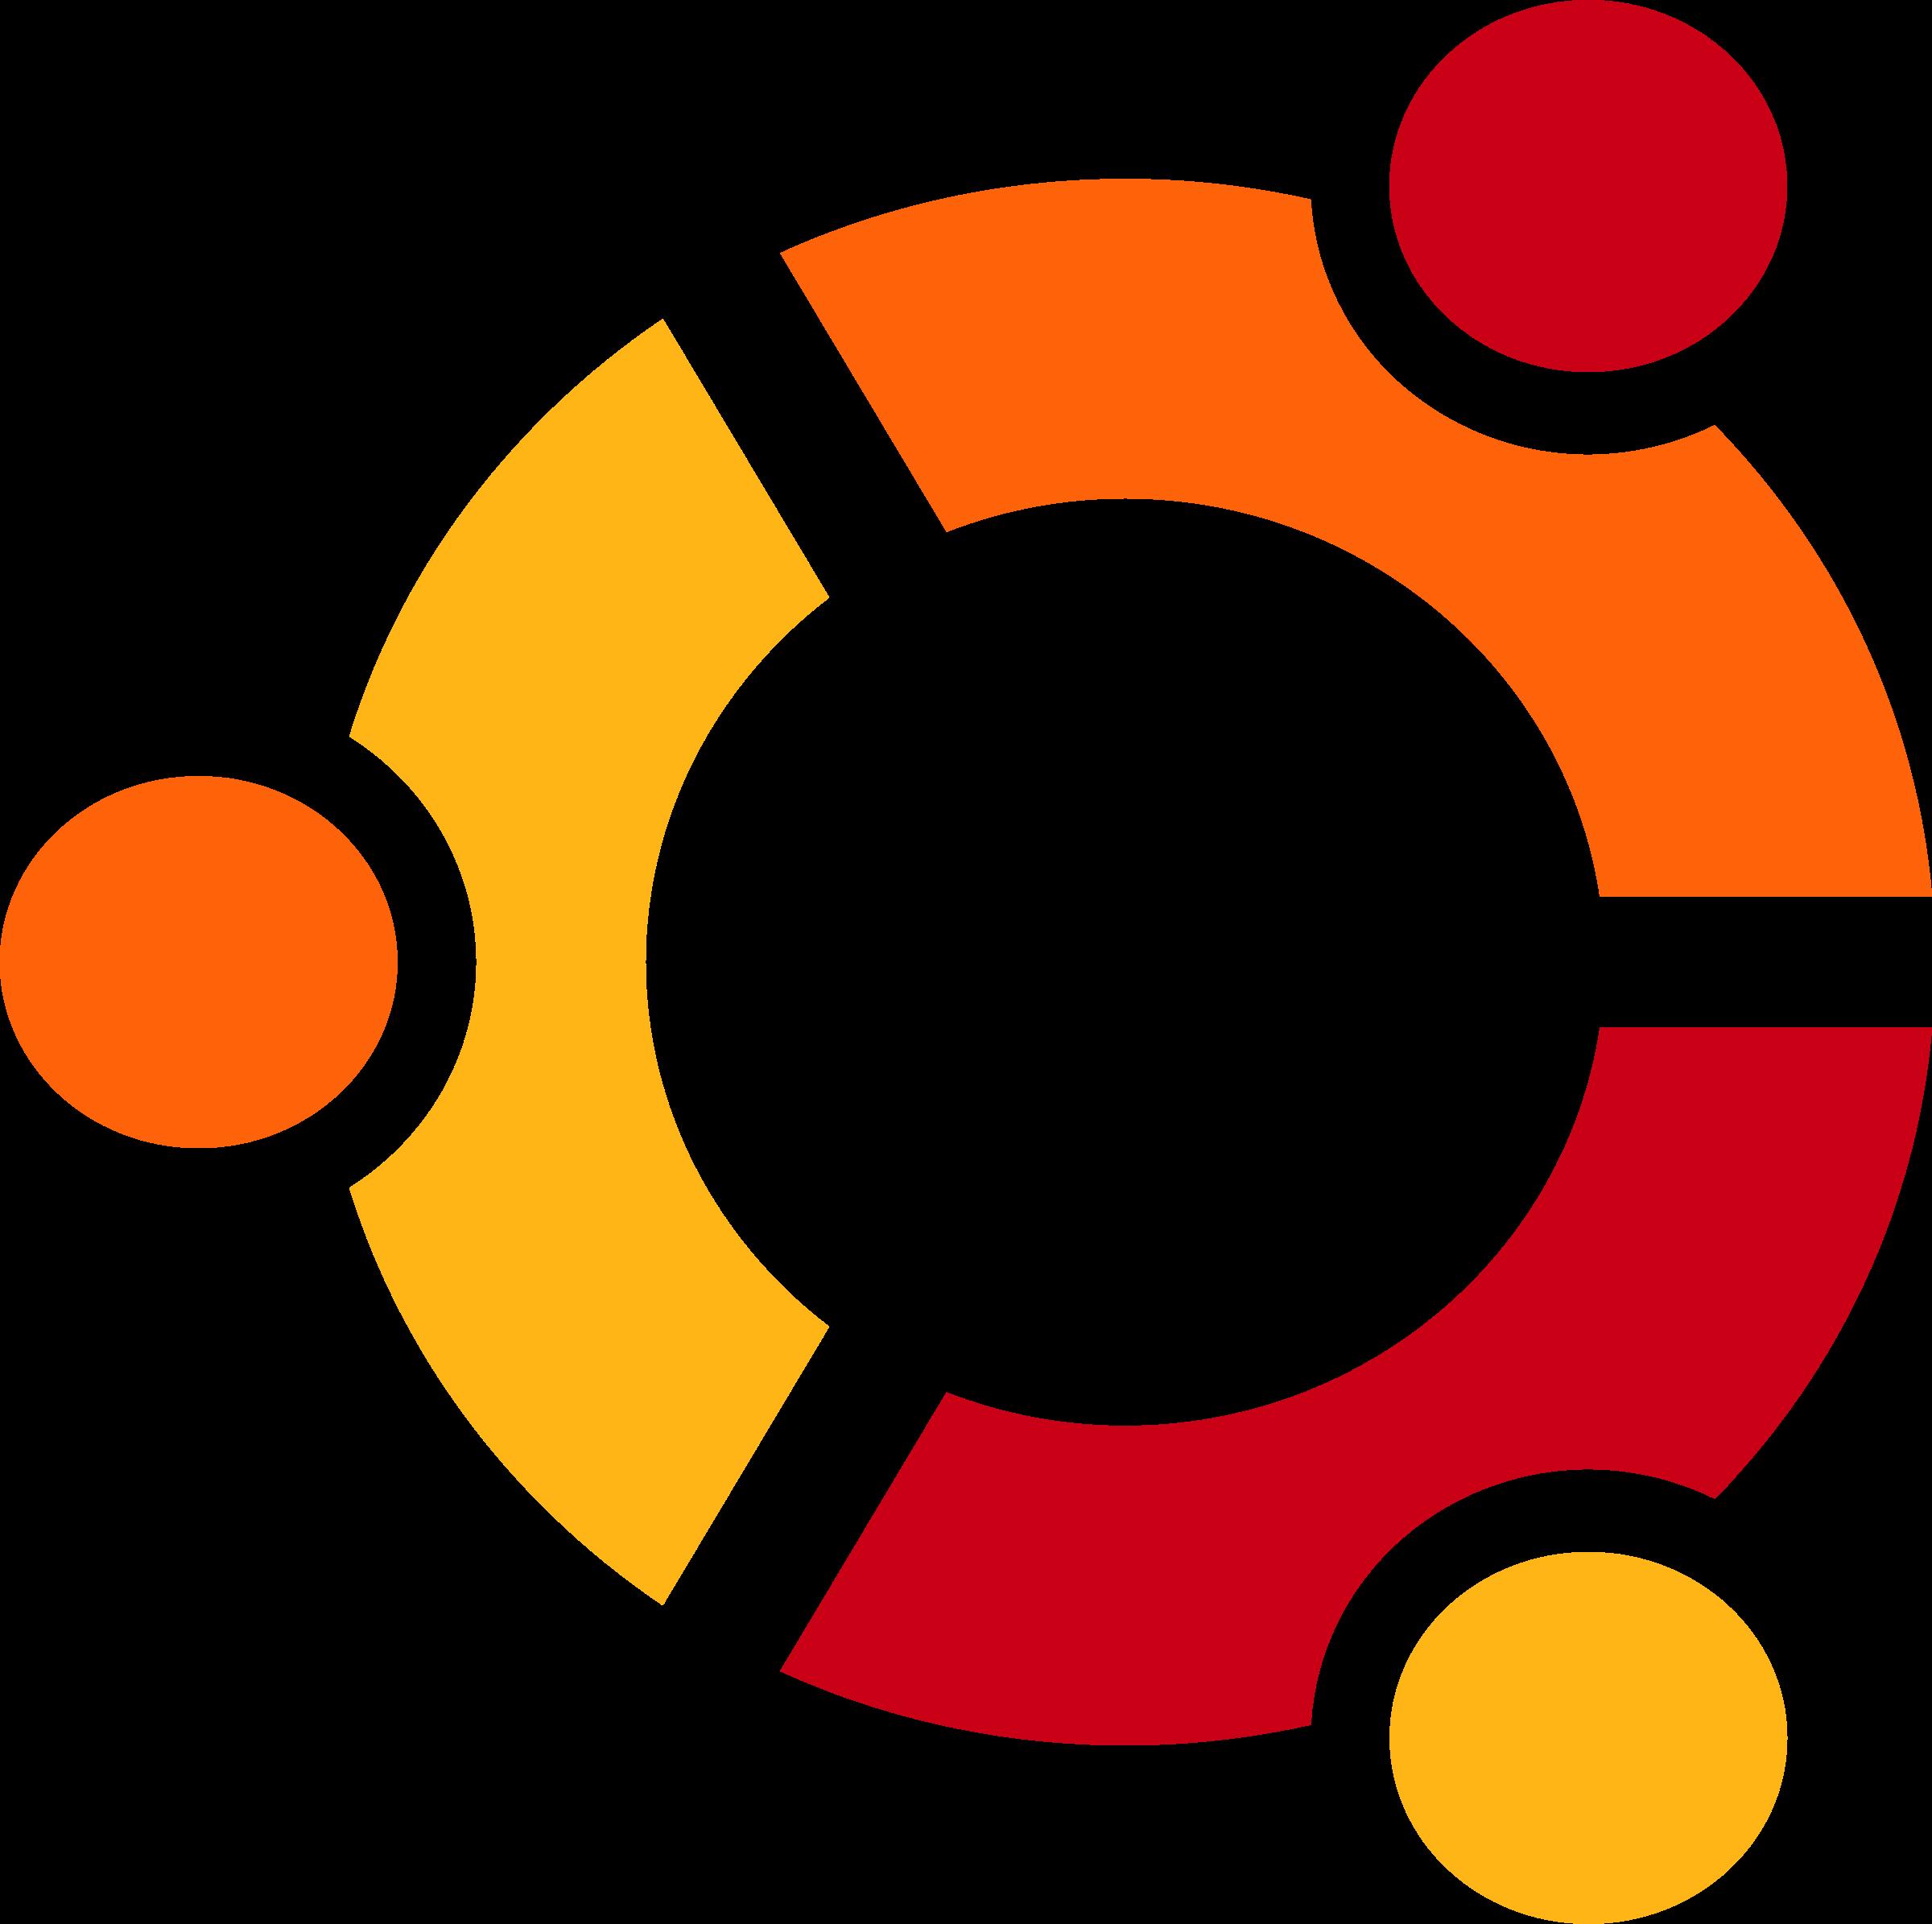 Ubuntu icon Logo PNG Transparent & SVG Vector.